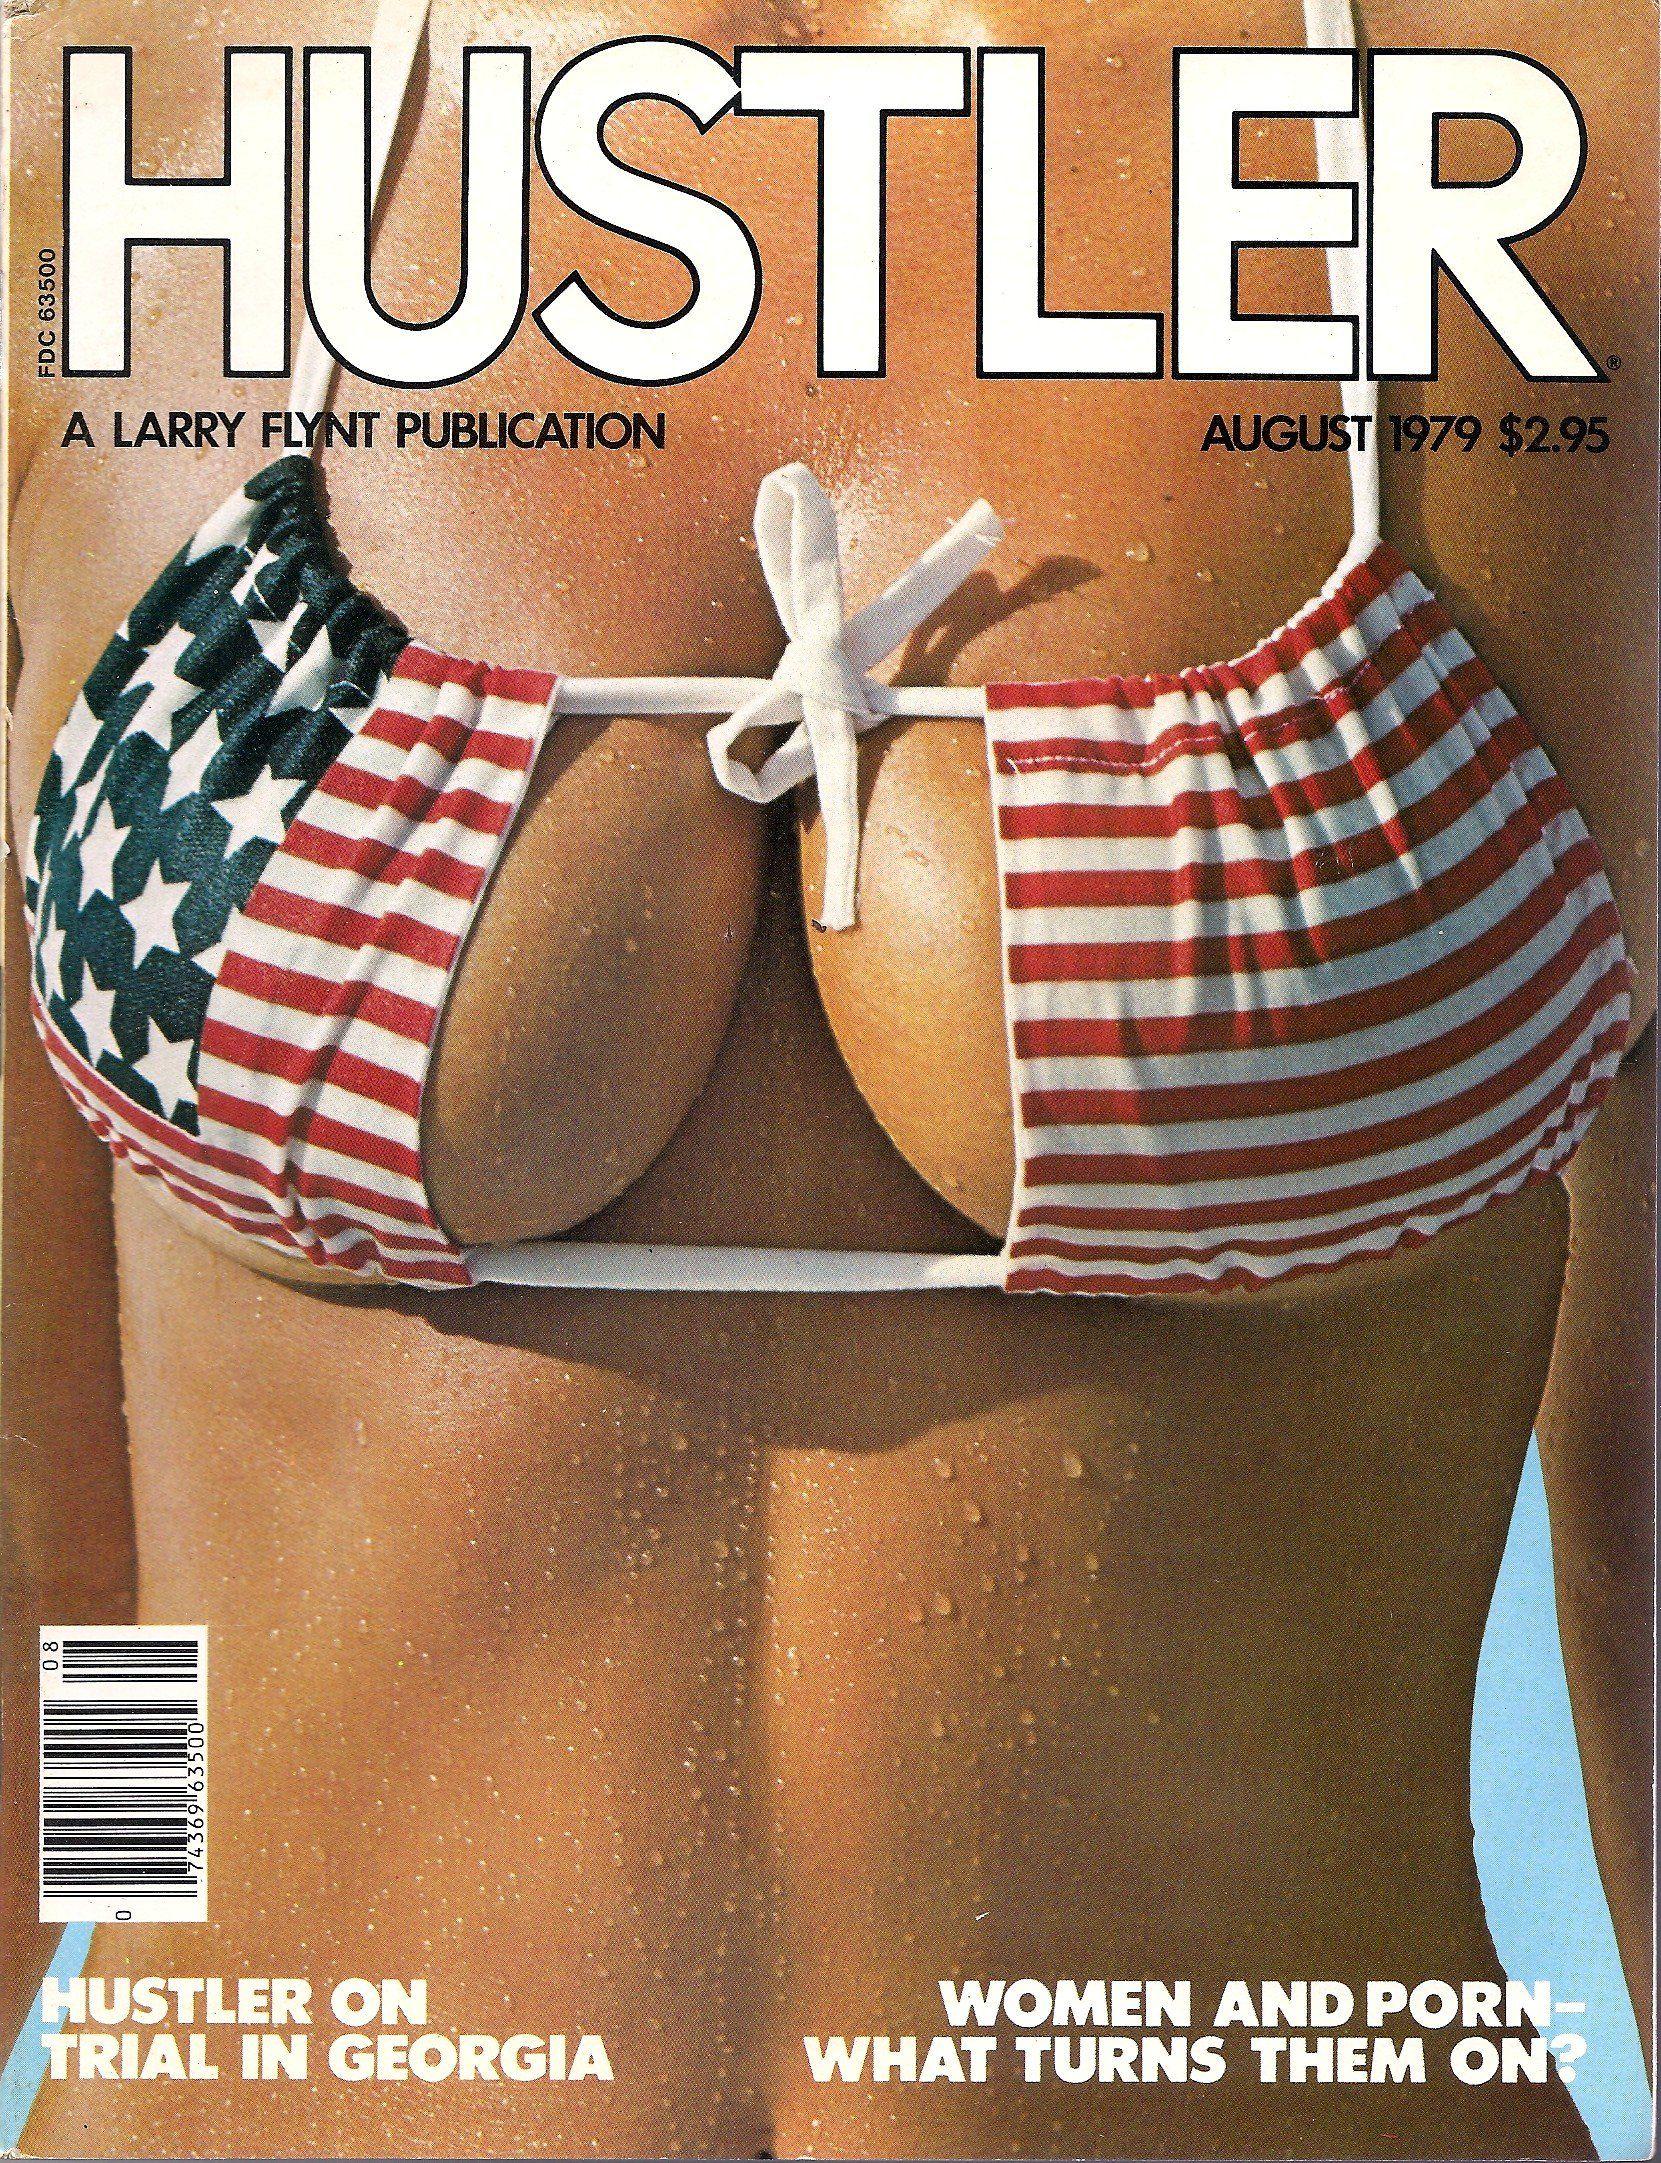 Hustler vs playboy